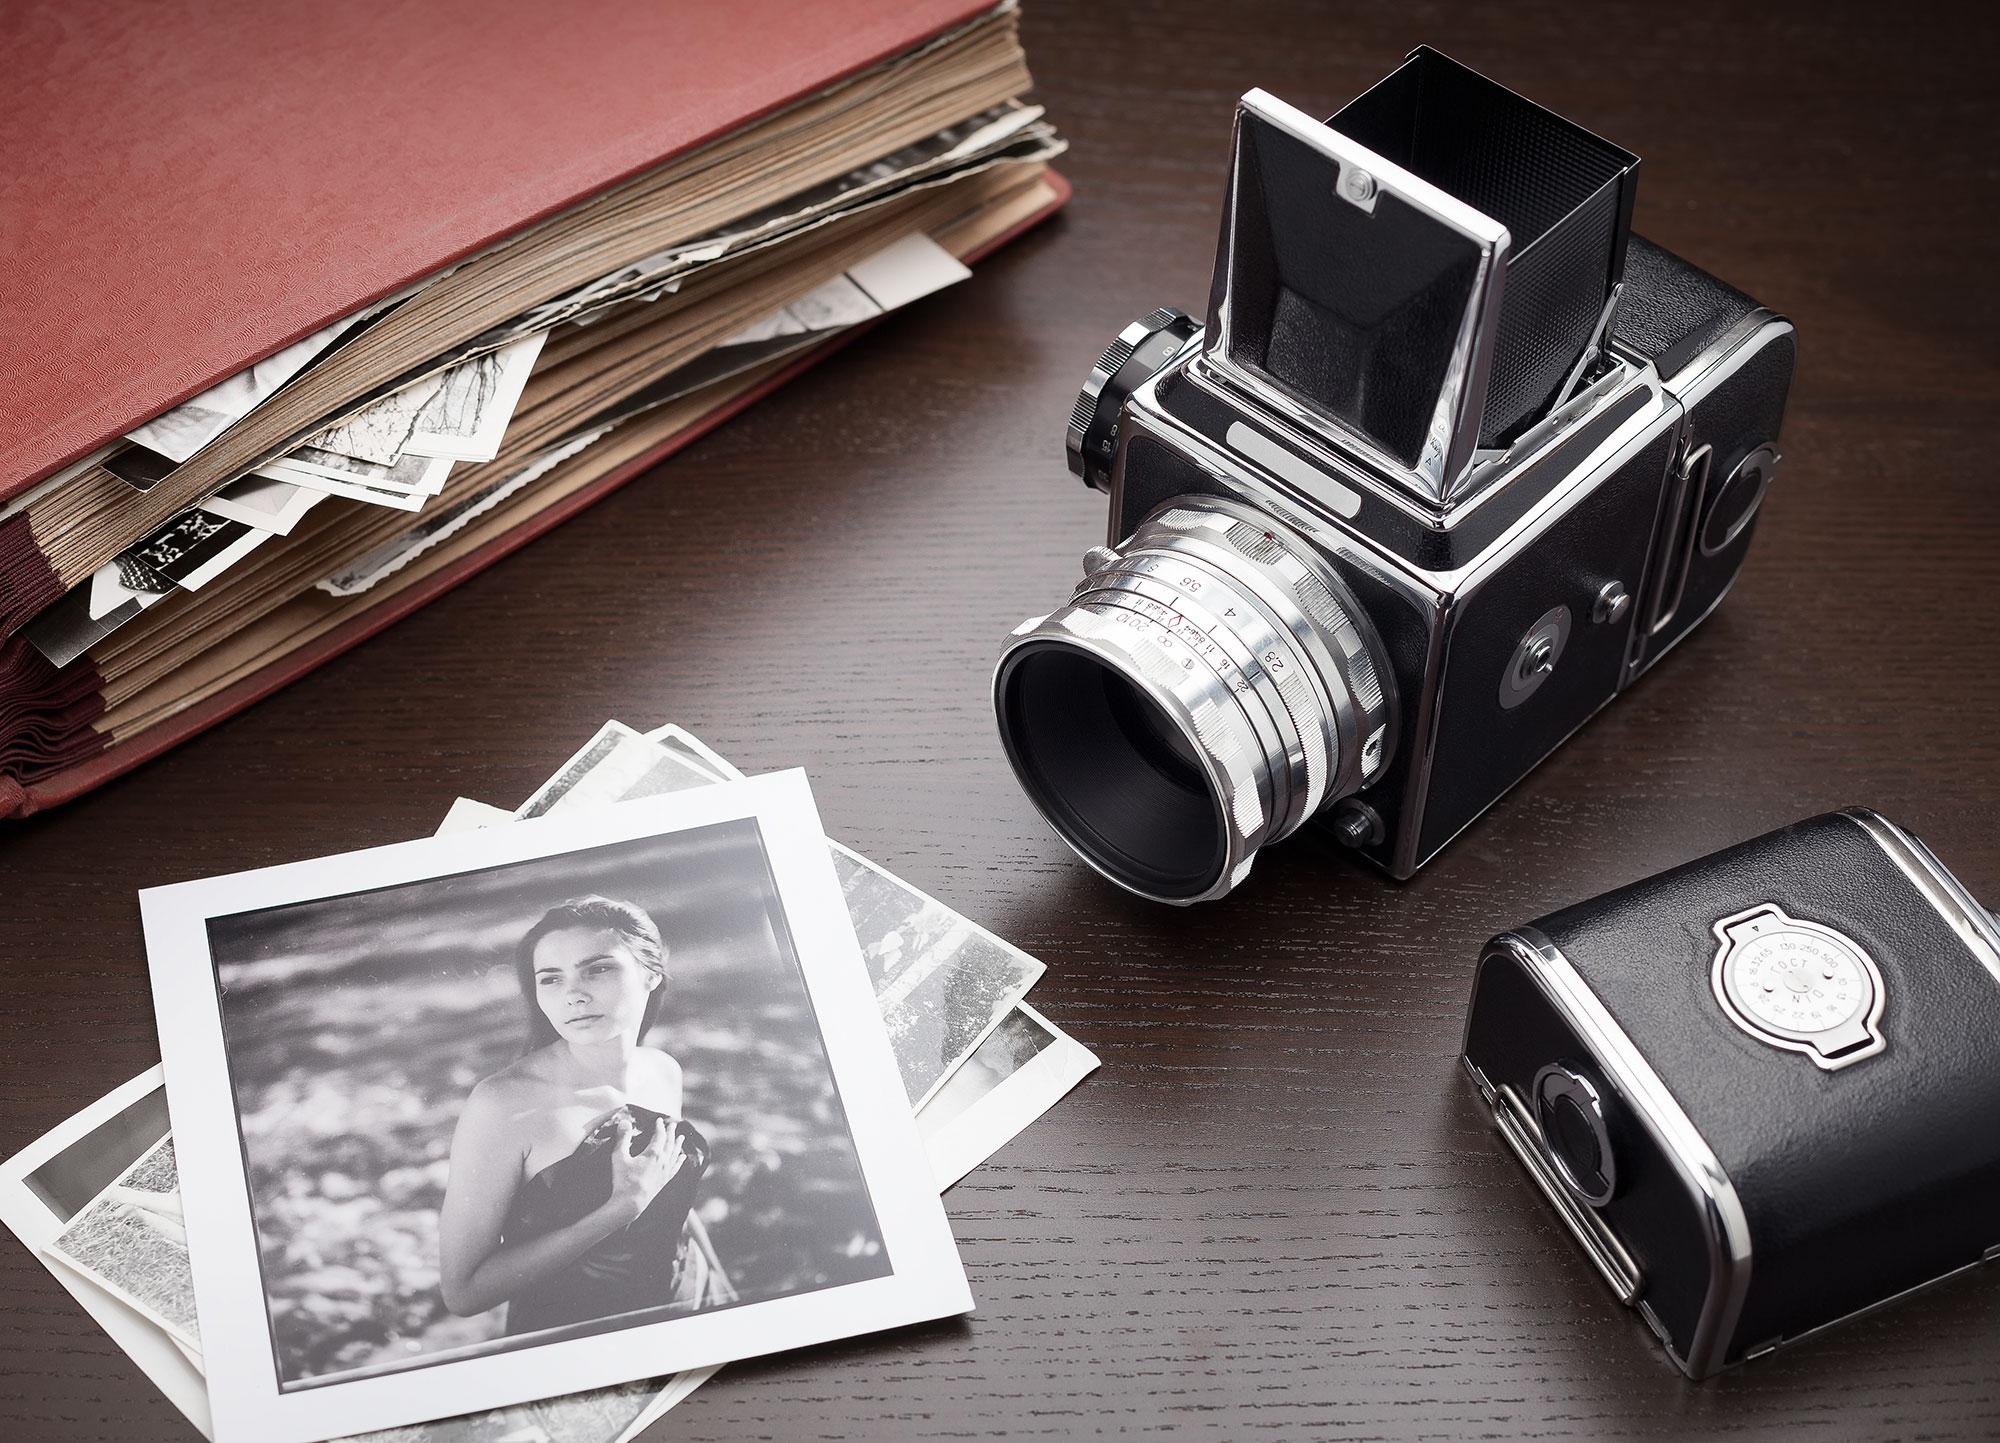 (Symbolbild, istockphoto.com)